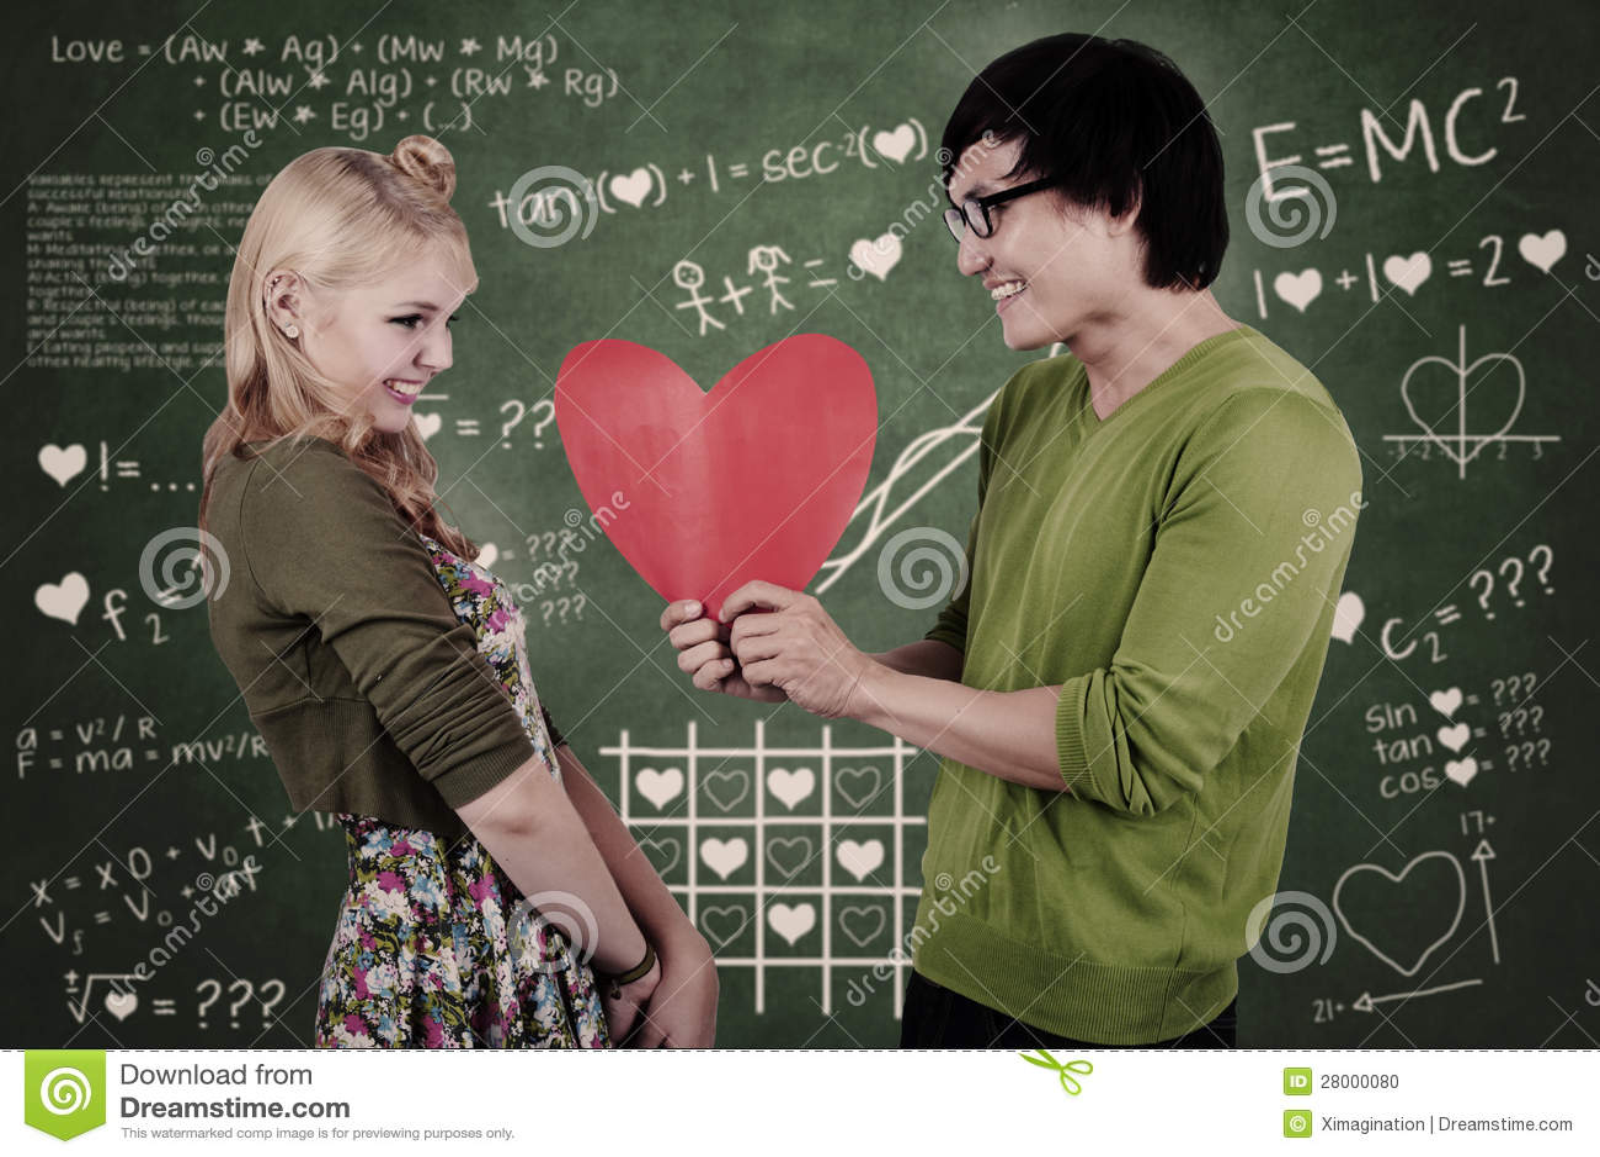 modèles datant nerds t shirt Dating fille